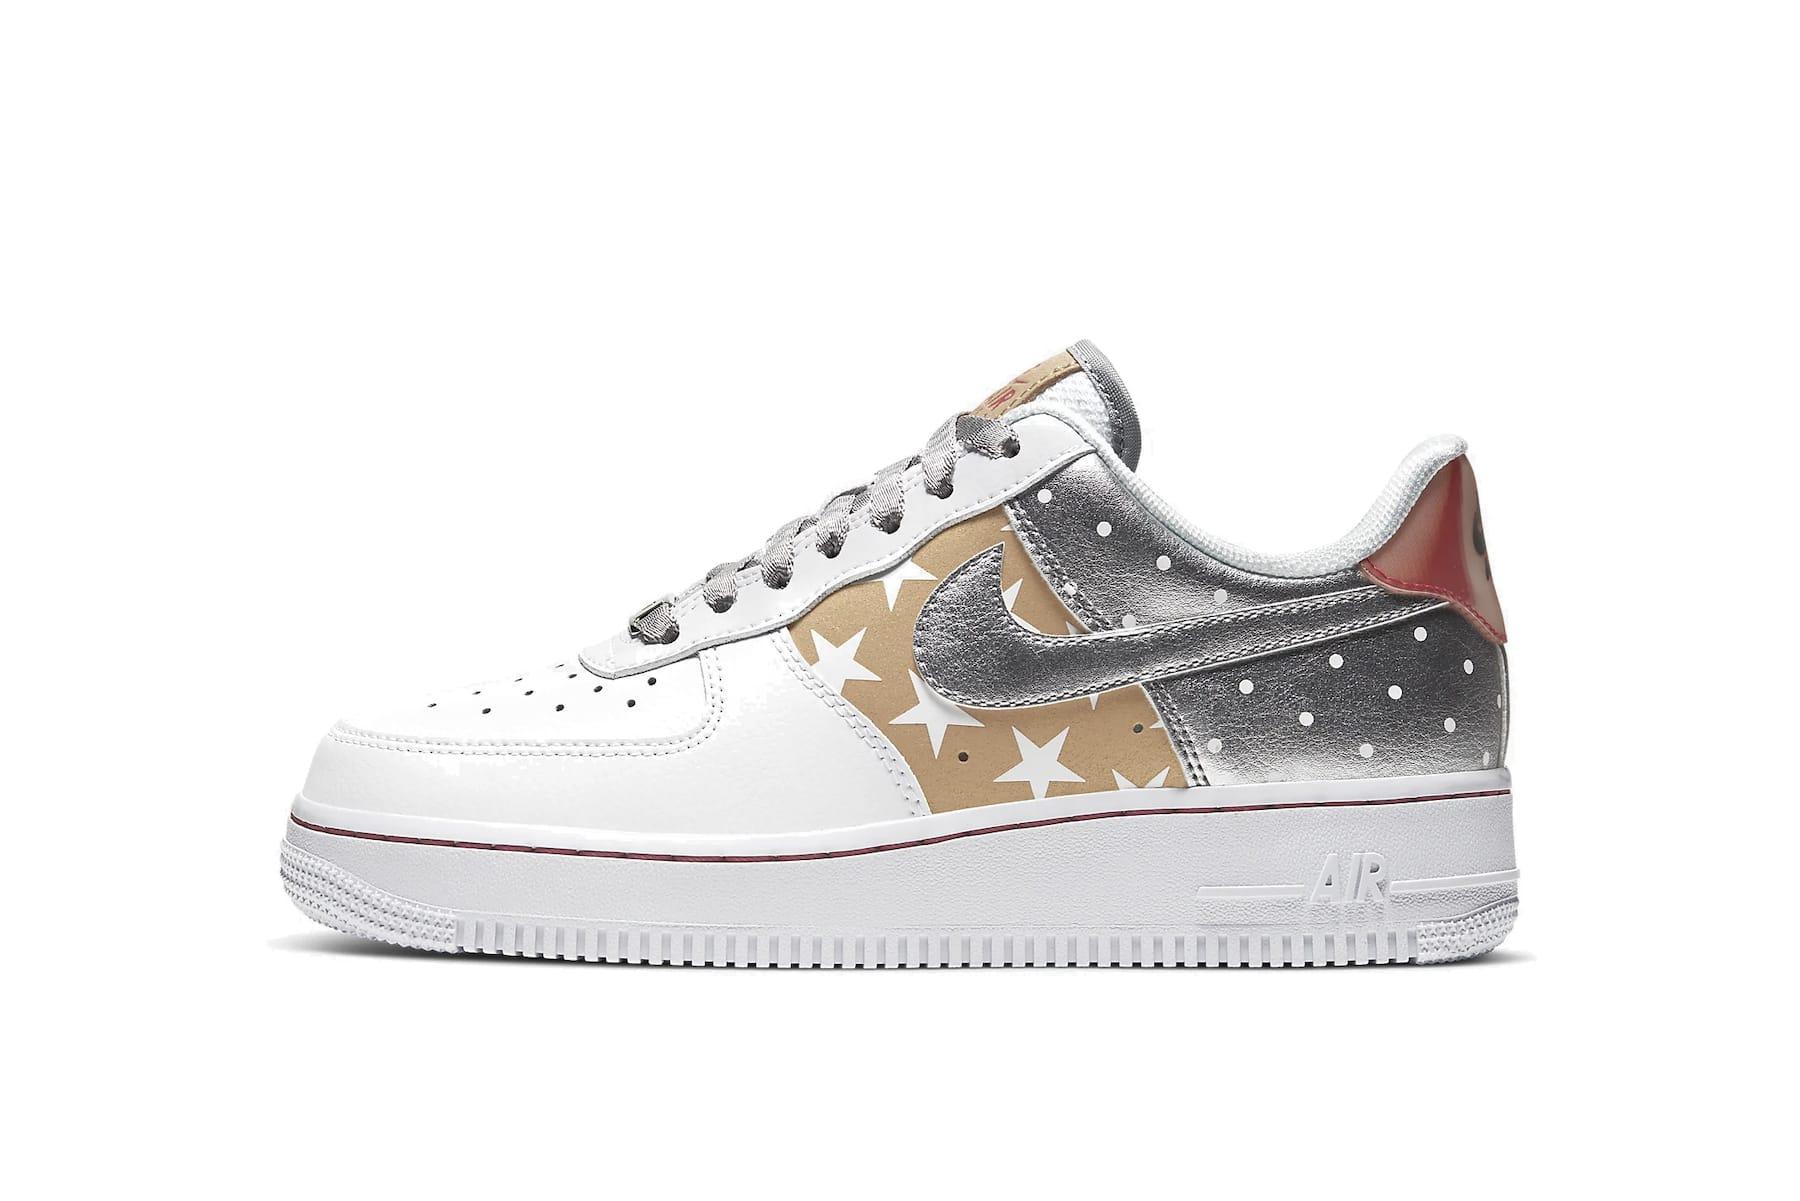 Nike Air Force 1 Metallic Gold Silver